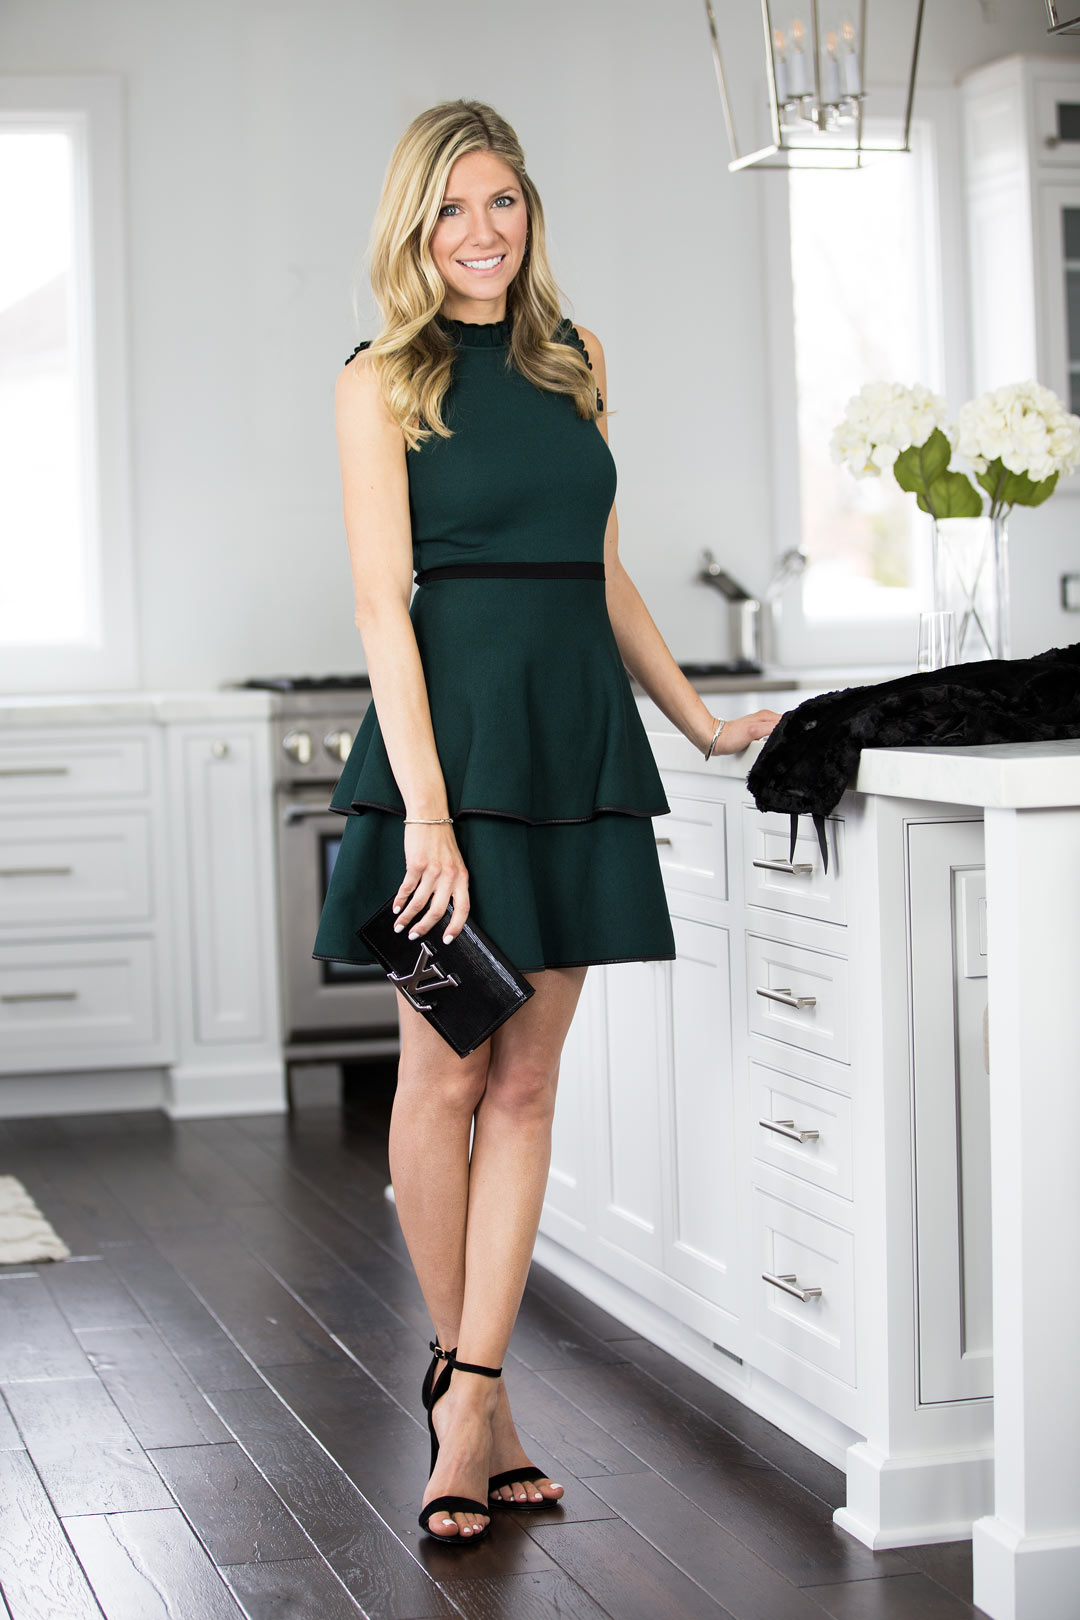 Rent the Runway Green Ryker dress by Parker